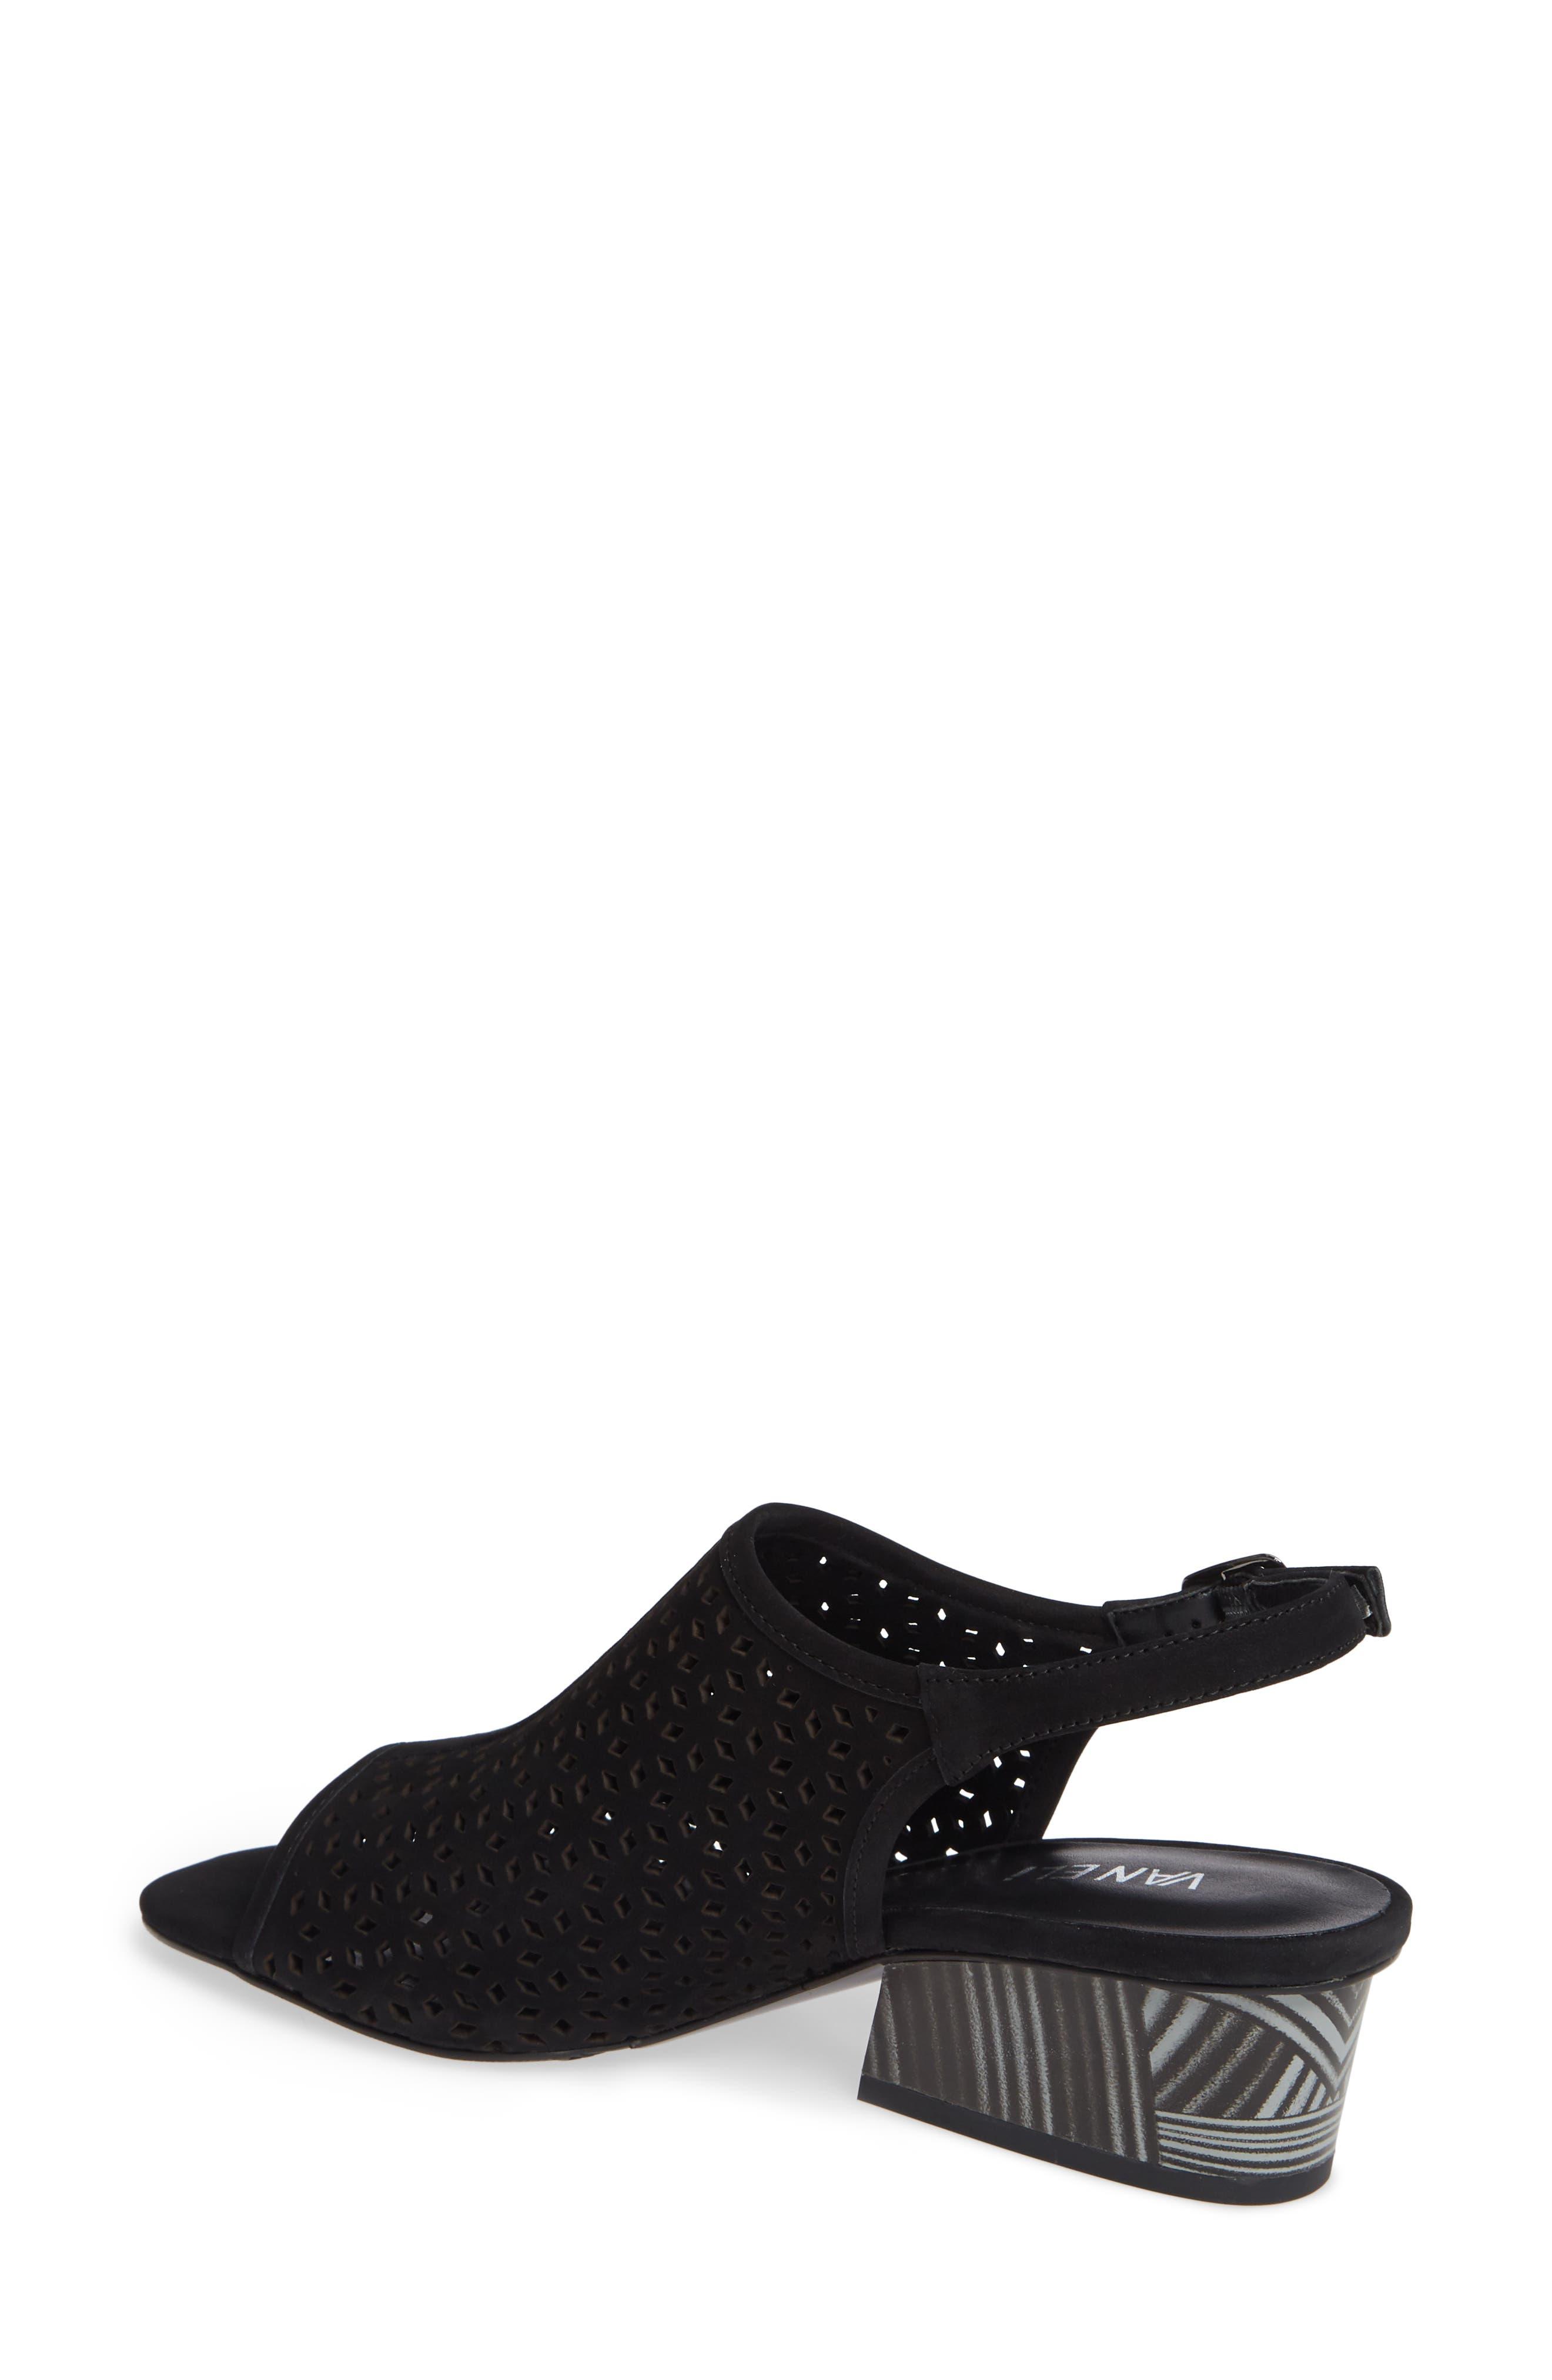 Candra Perforated Sandal,                             Alternate thumbnail 2, color,                             BLACK NUBUCK LEATHER